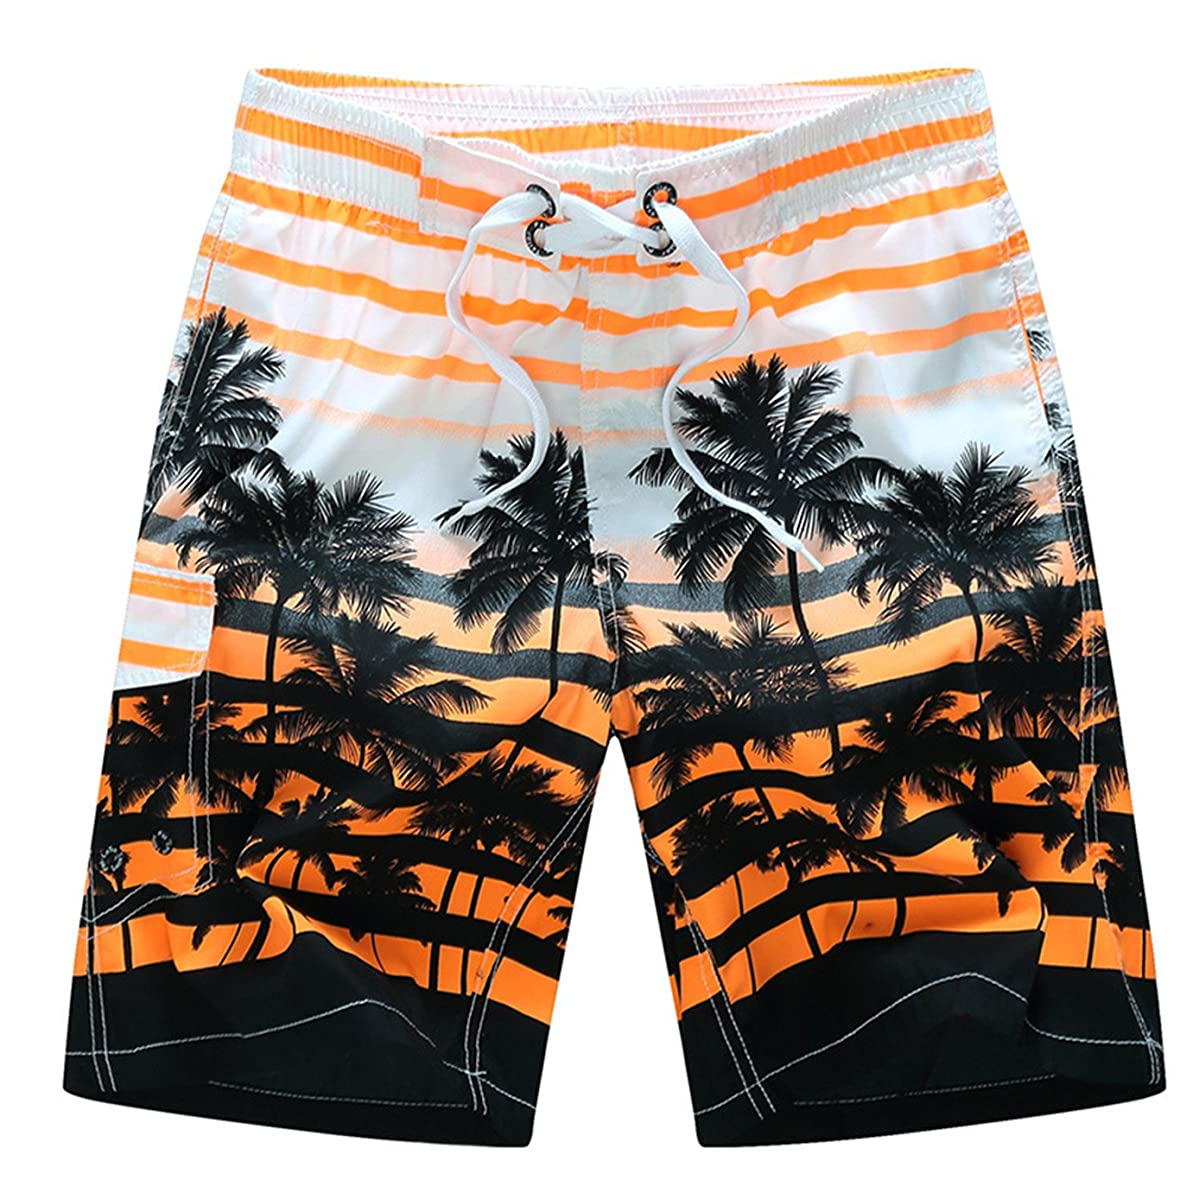 WESIZAR Men's Summer Short Swim Trunks Casual Quick Dry Boardshorts